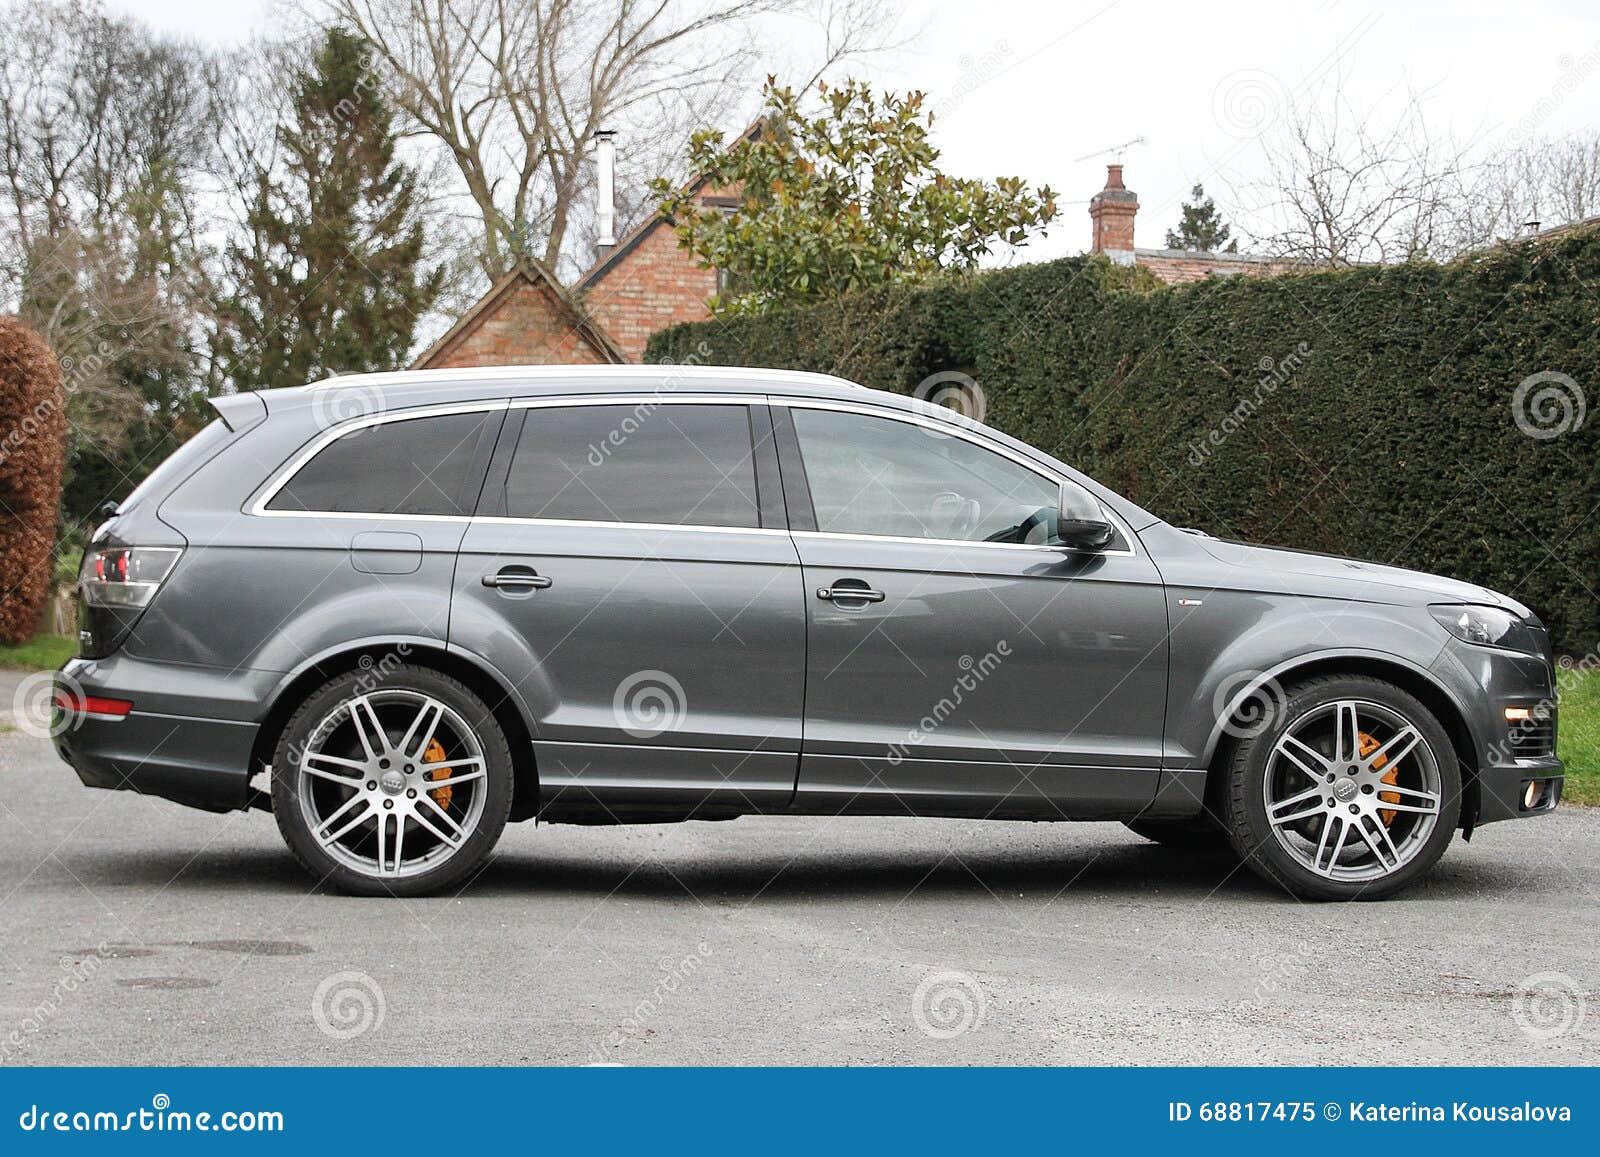 Grey Suv Audi Editorial Image Image